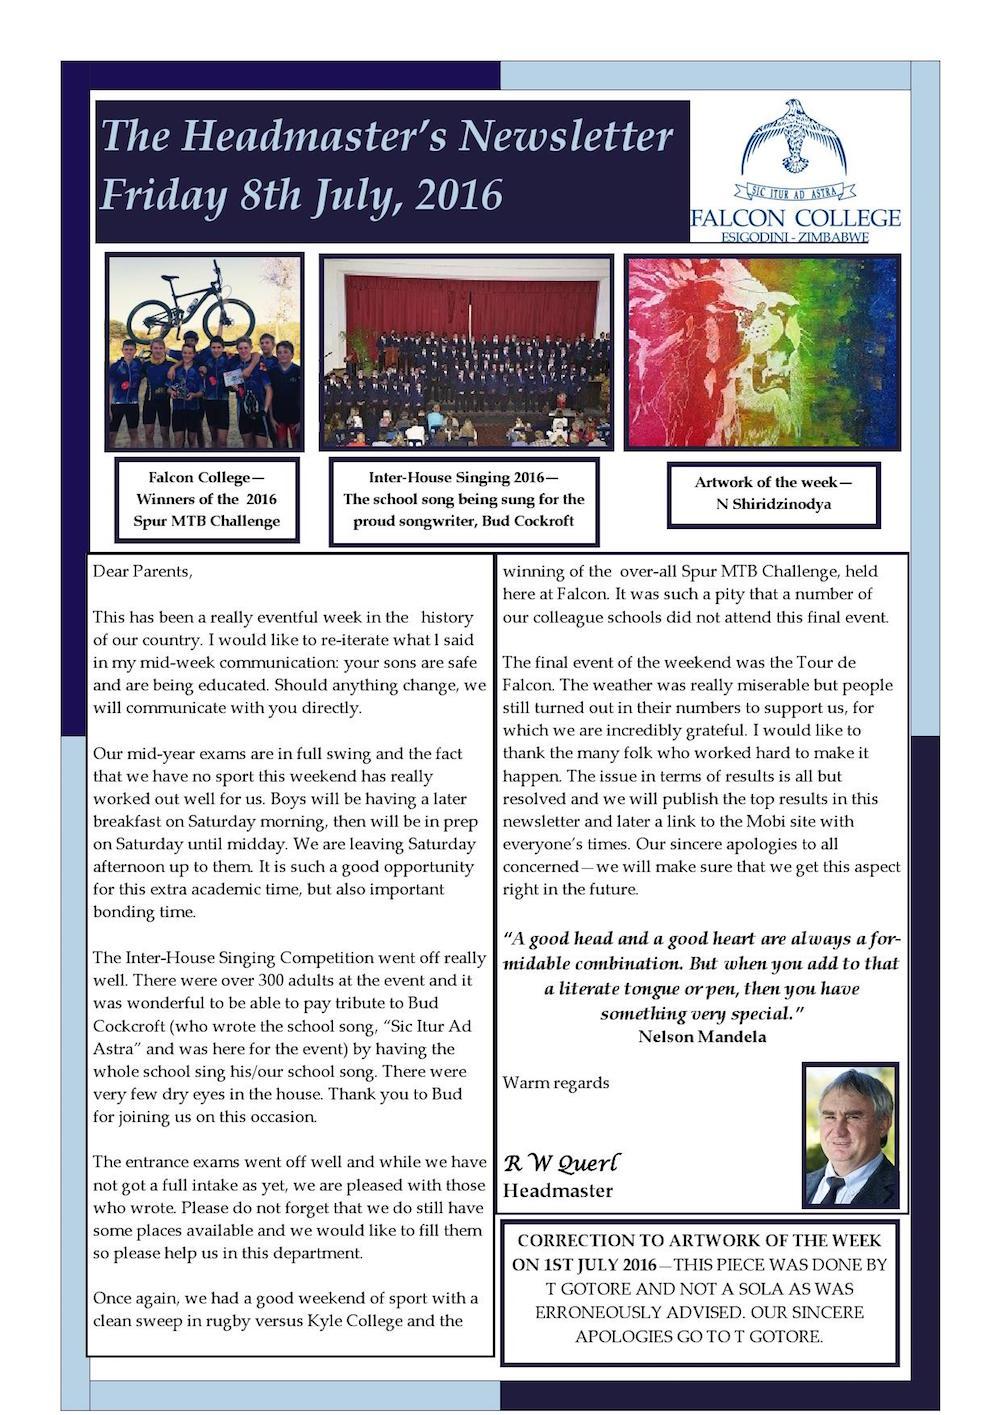 Headmaster's Newsletter Friday 8th July 2016 edited_000001